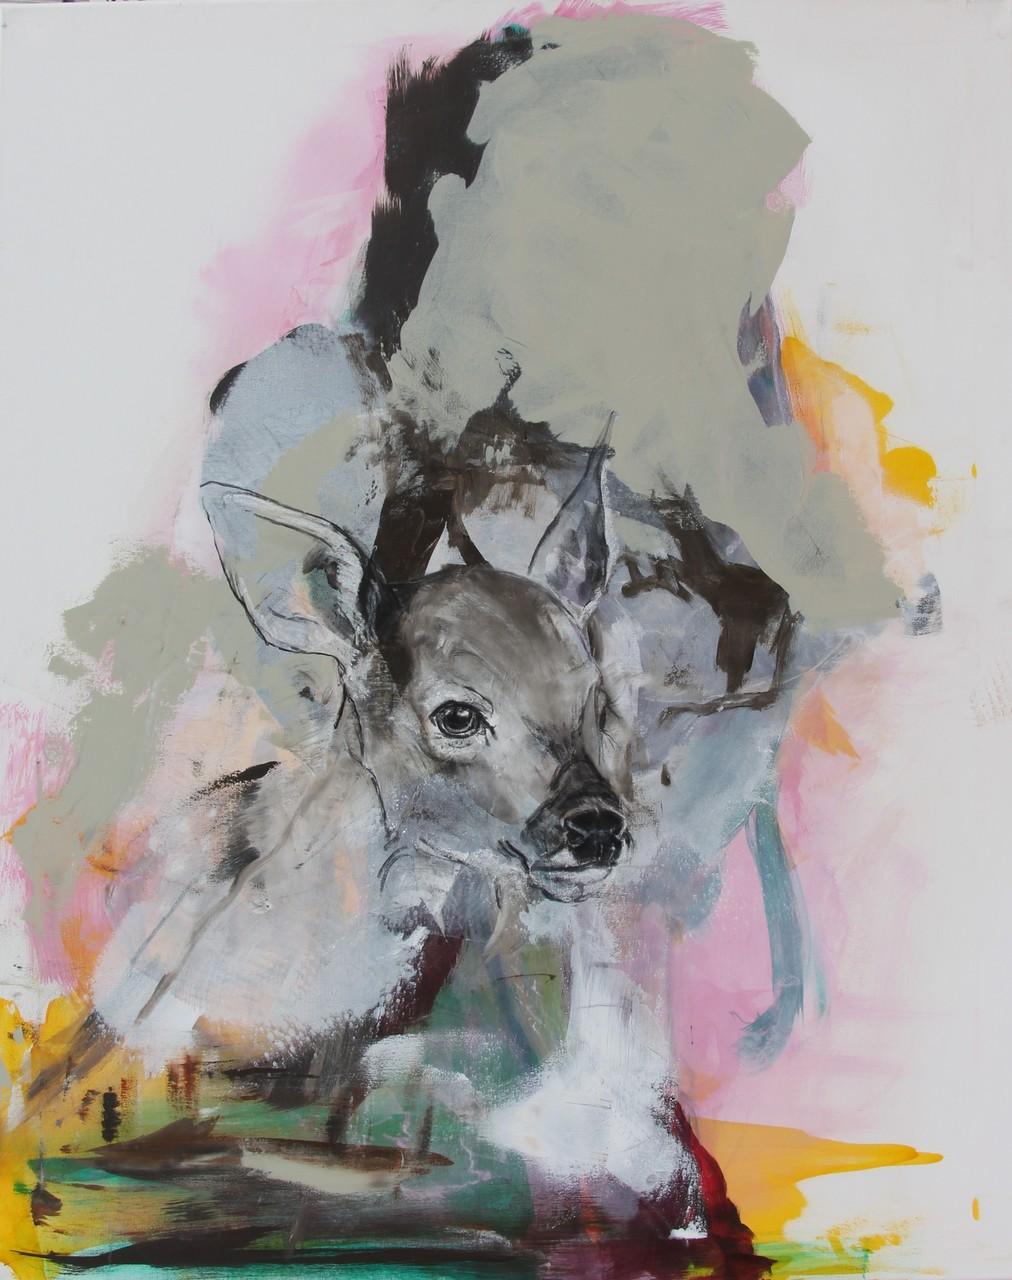 Schattenmann -  Acryl, Kohle, Kreide auf Leinwand   100 cm x 80 cm